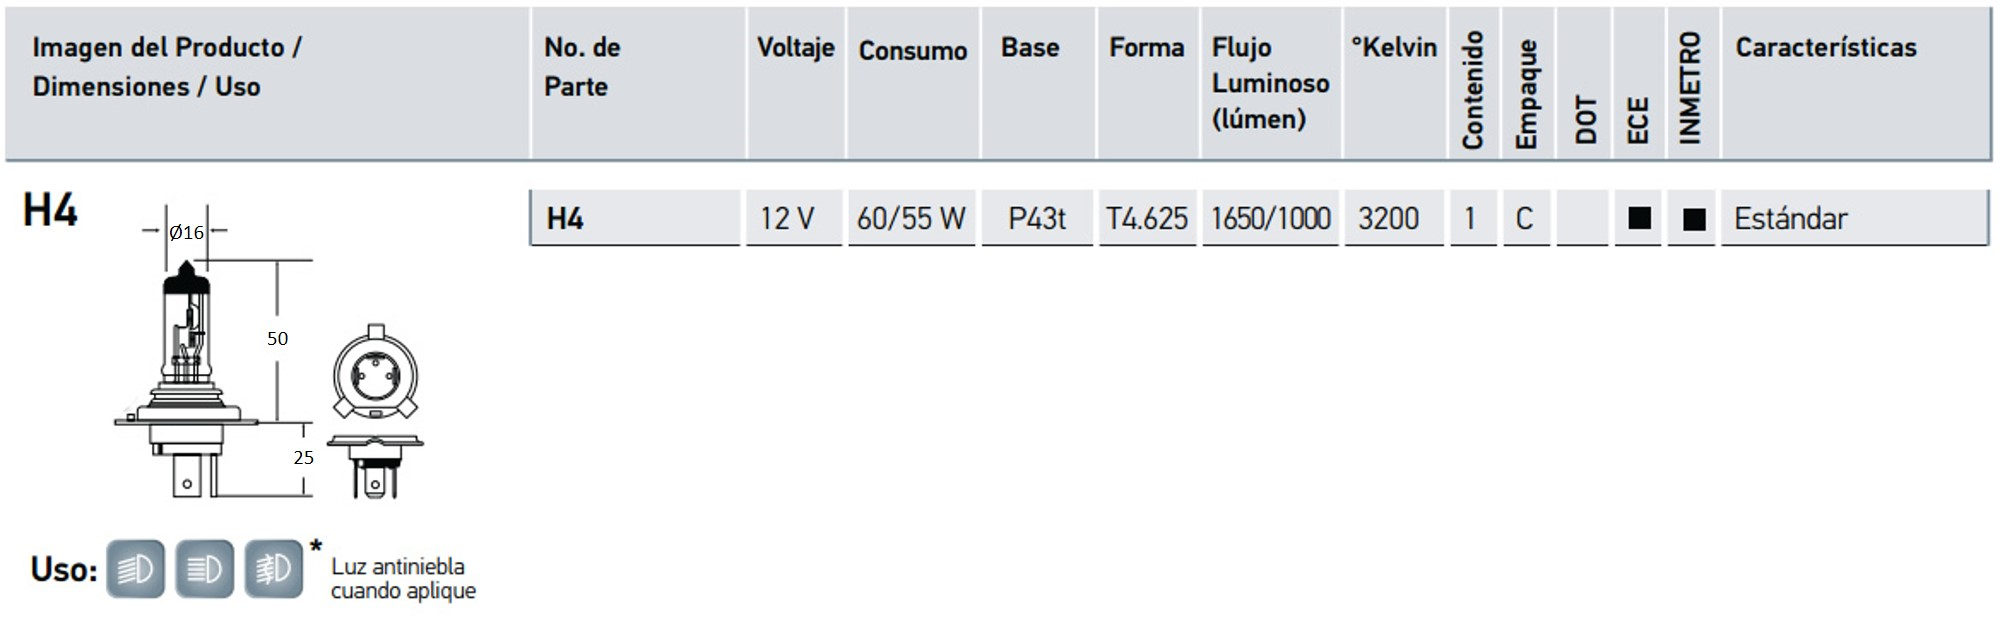 h4 12v ficha tecnica autodata sac